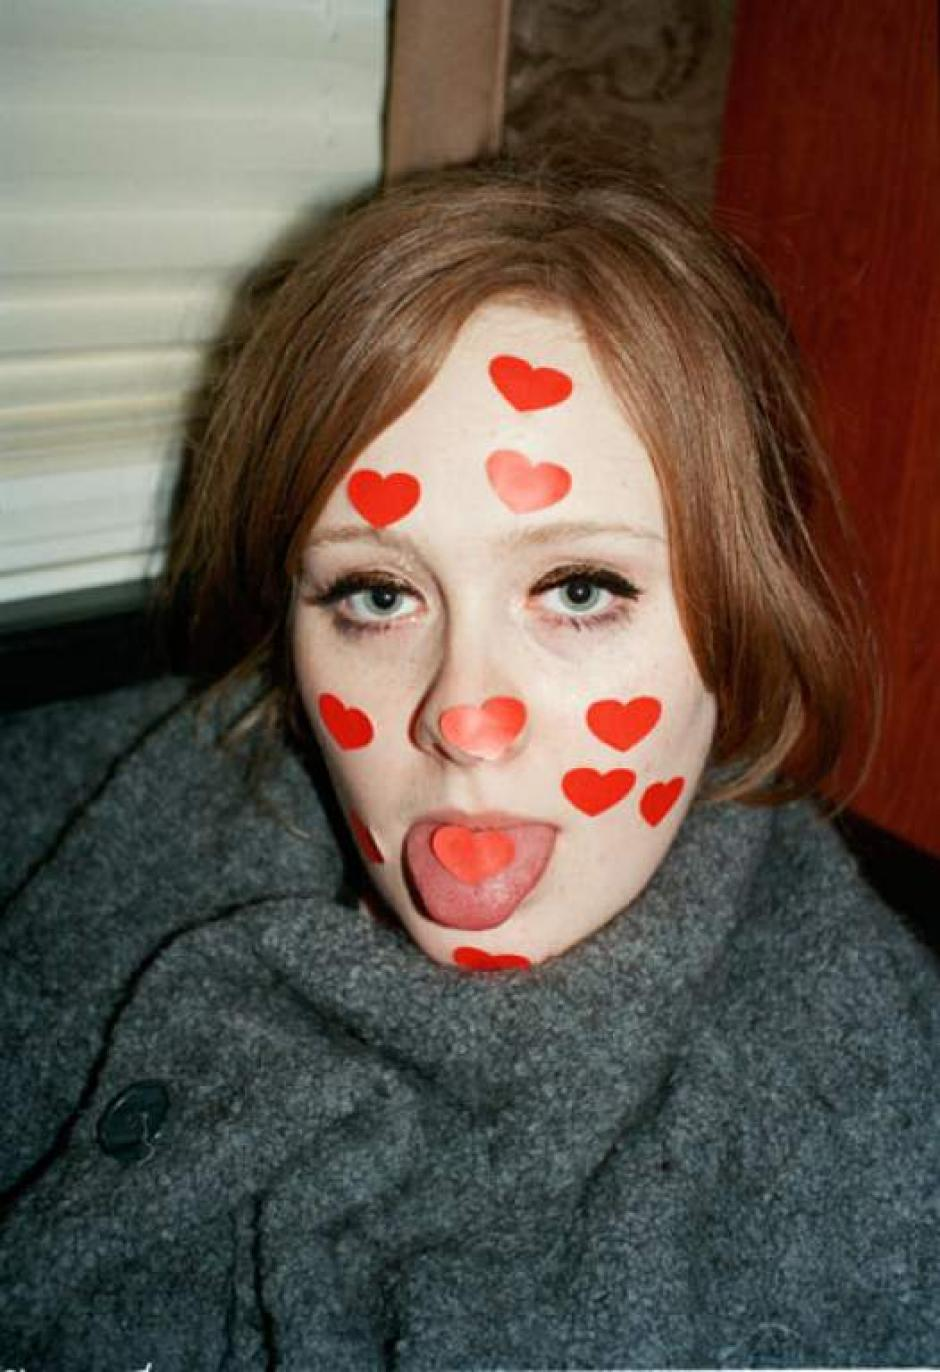 Adele se muestra relajada y feliz. (Foto: alexsturrock)